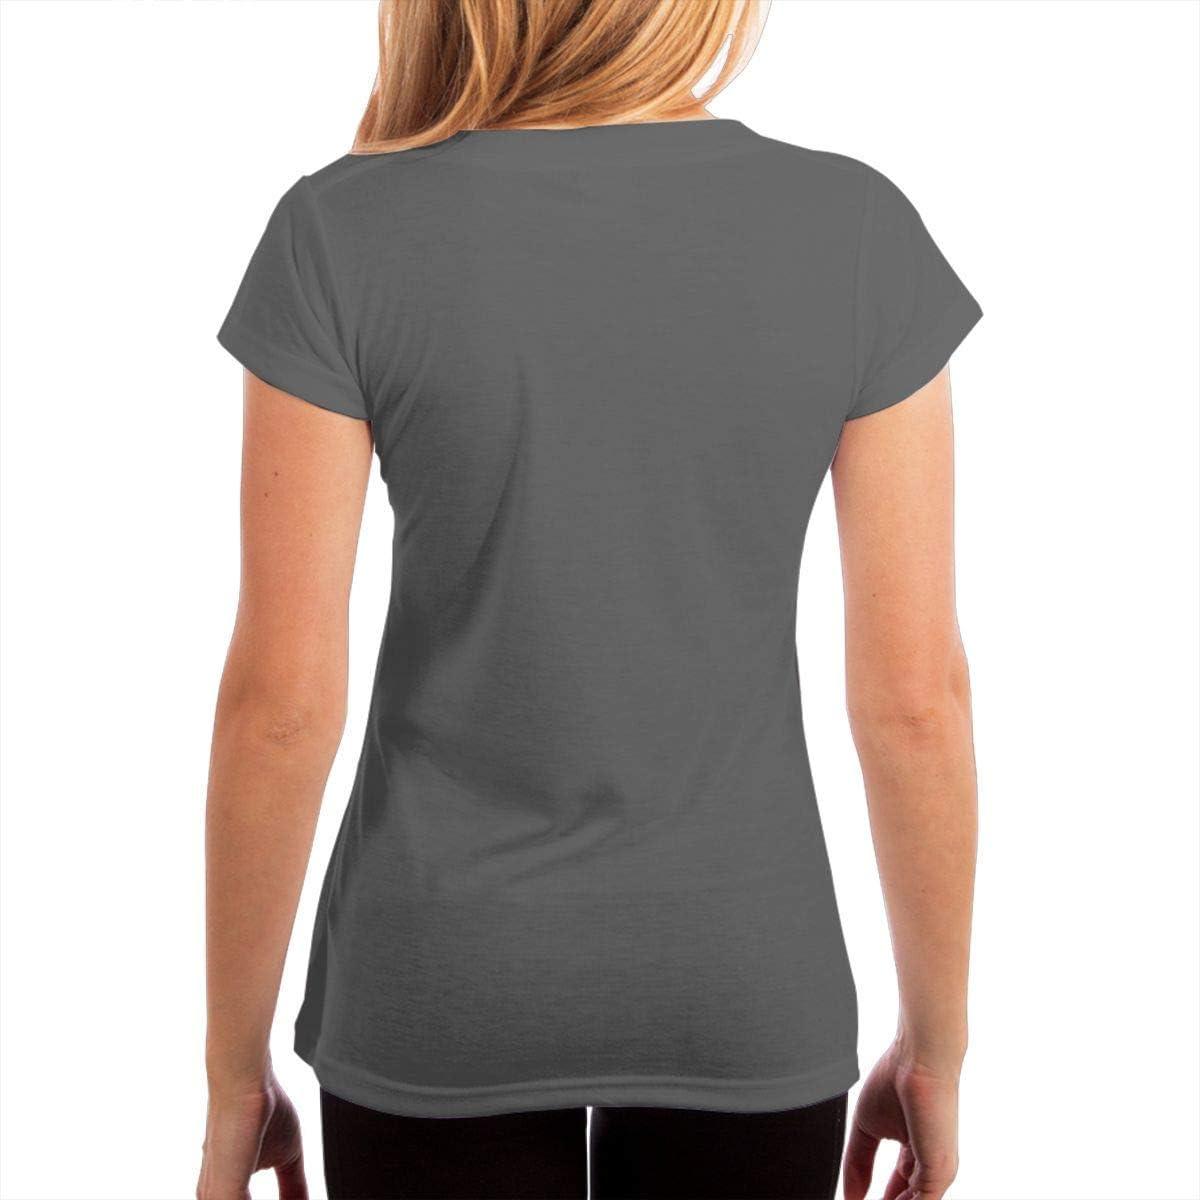 YUNJIYIFANG American Veterans Amvets Women V Neck Short Sleeve T-Shirt Basic Casual Cotton Blouse Shirts